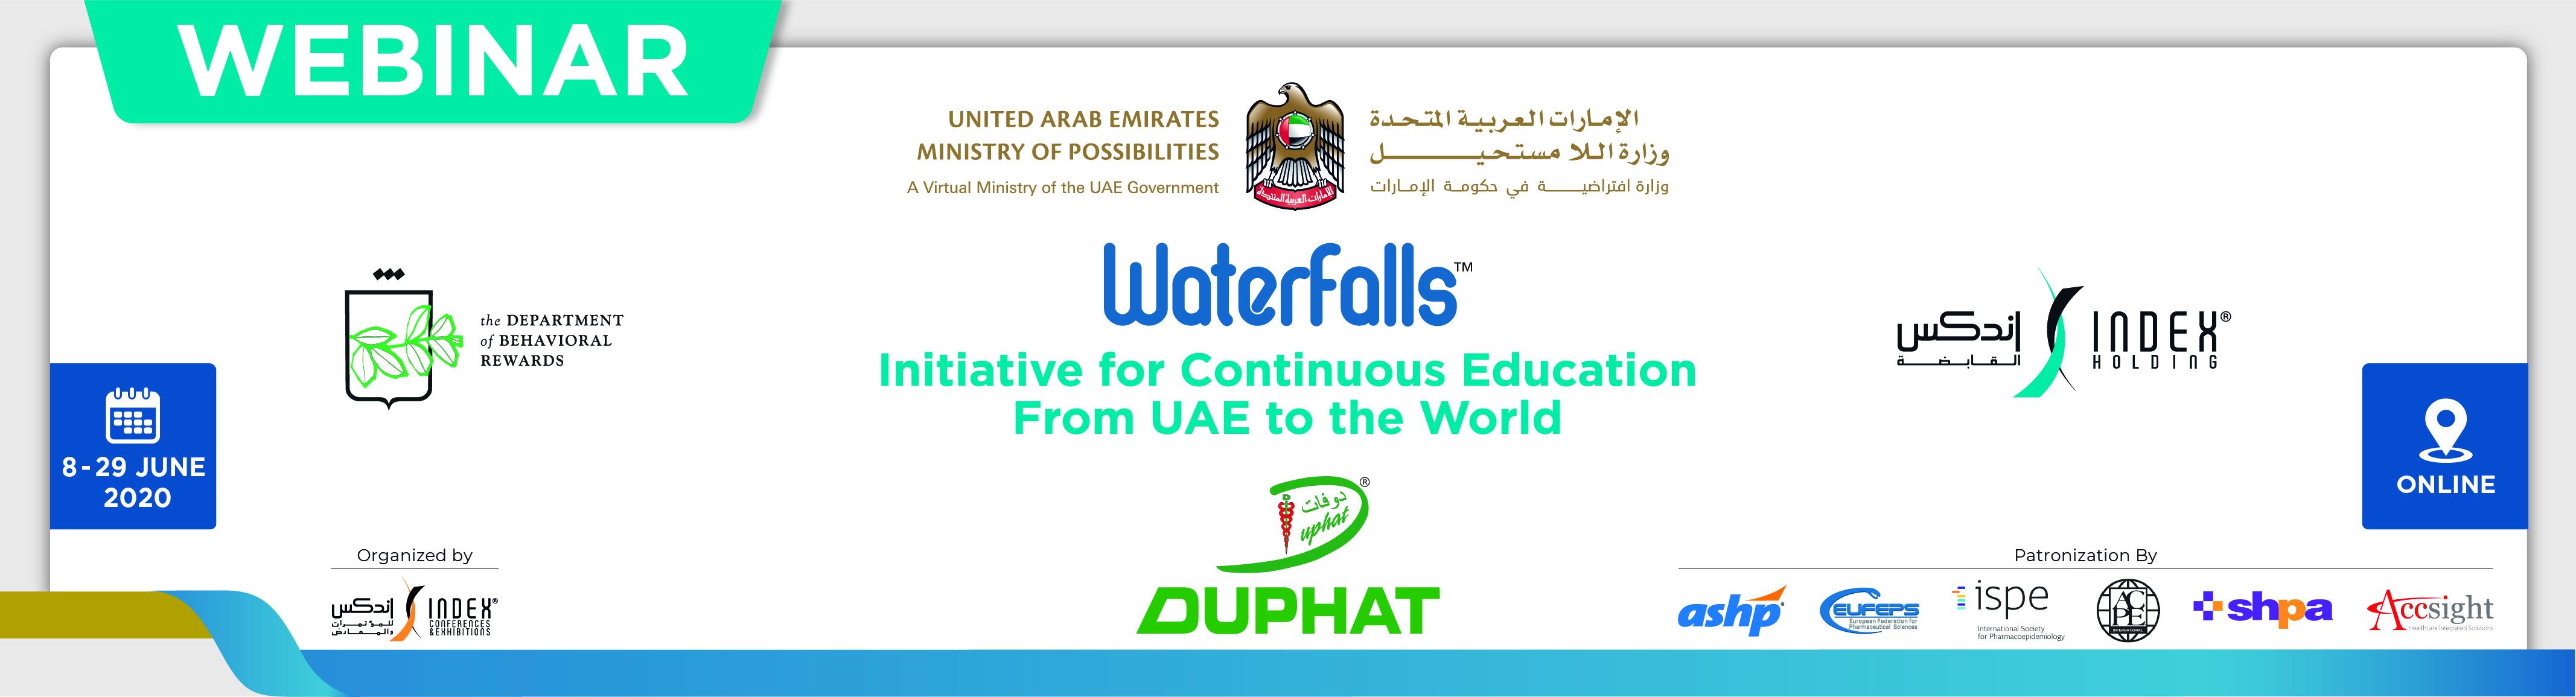 DUPHAT WATERFALLS: HEALTH ECONOMICS: INNOVATIVE CONTRACTING TOOL, June 17 (17:00 - 18:00)